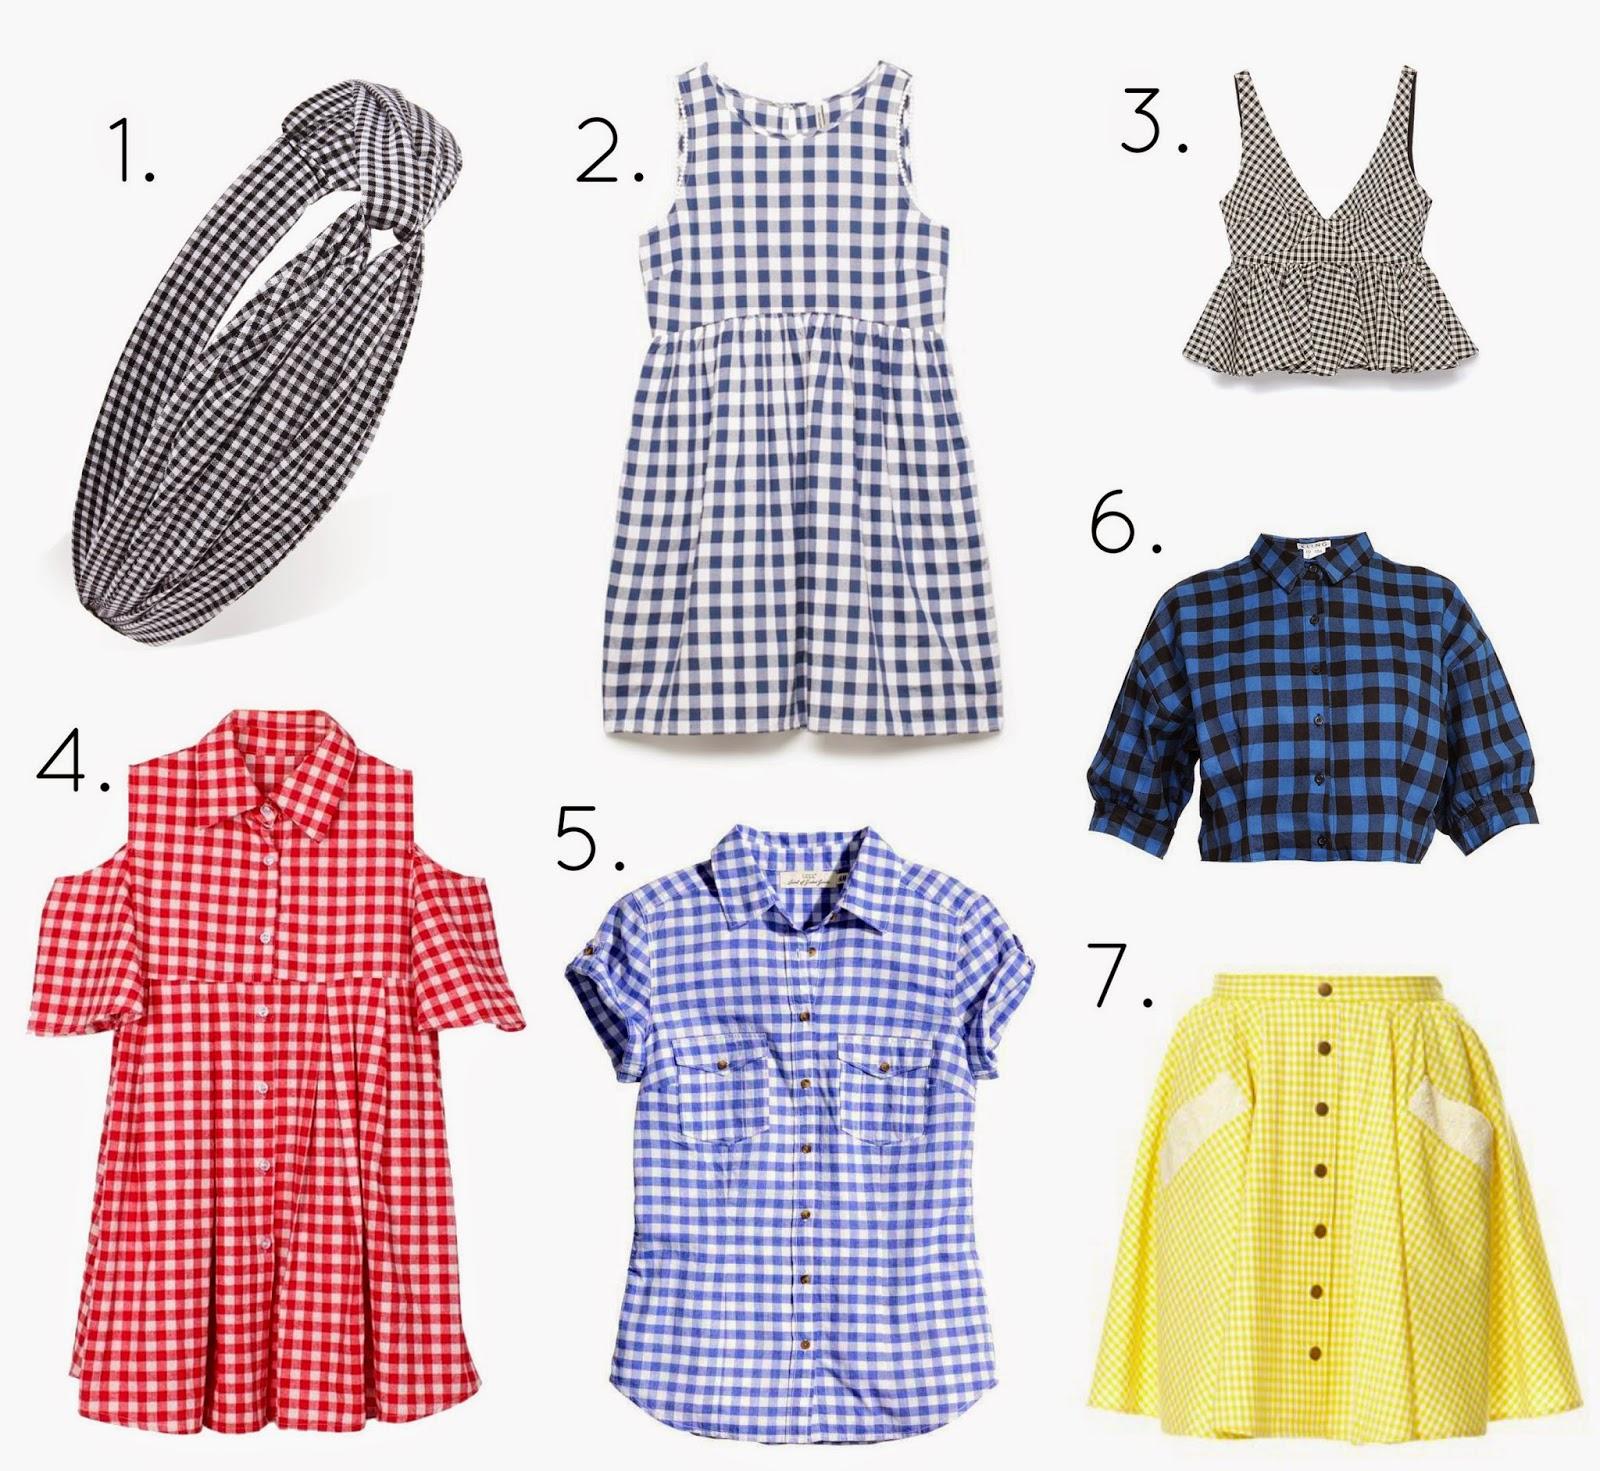 Tendencia cuadros vichy gingham moda trendy primavera verano 2015 productos compras shopping cuadro falda top Zara Monoush estilo estilismo